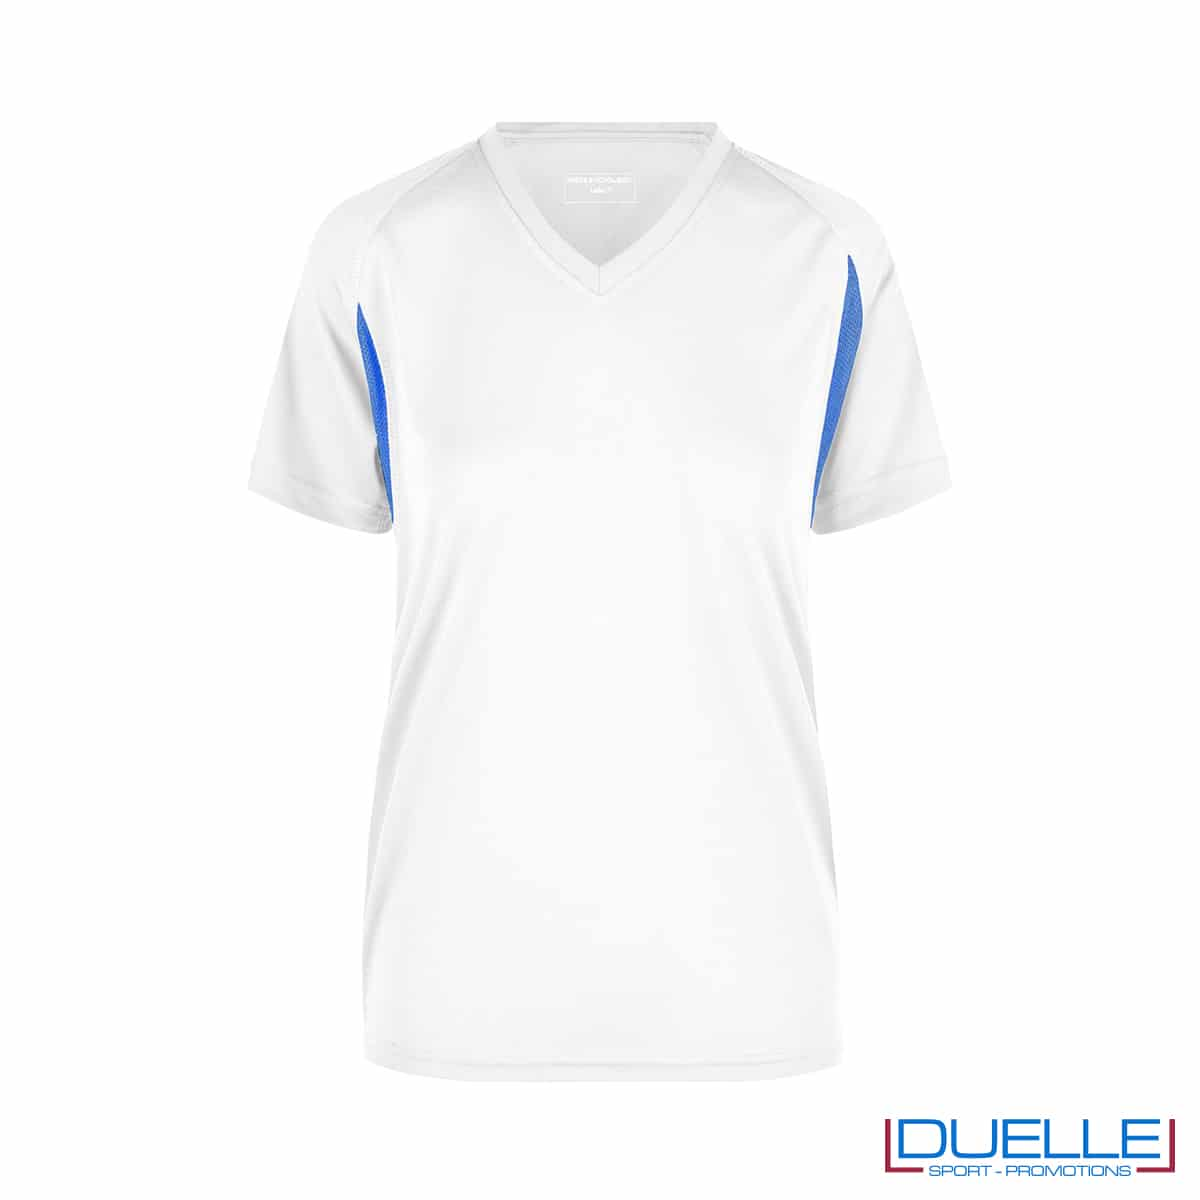 T-shirt running donna personalizzata colore bianco-blu royal